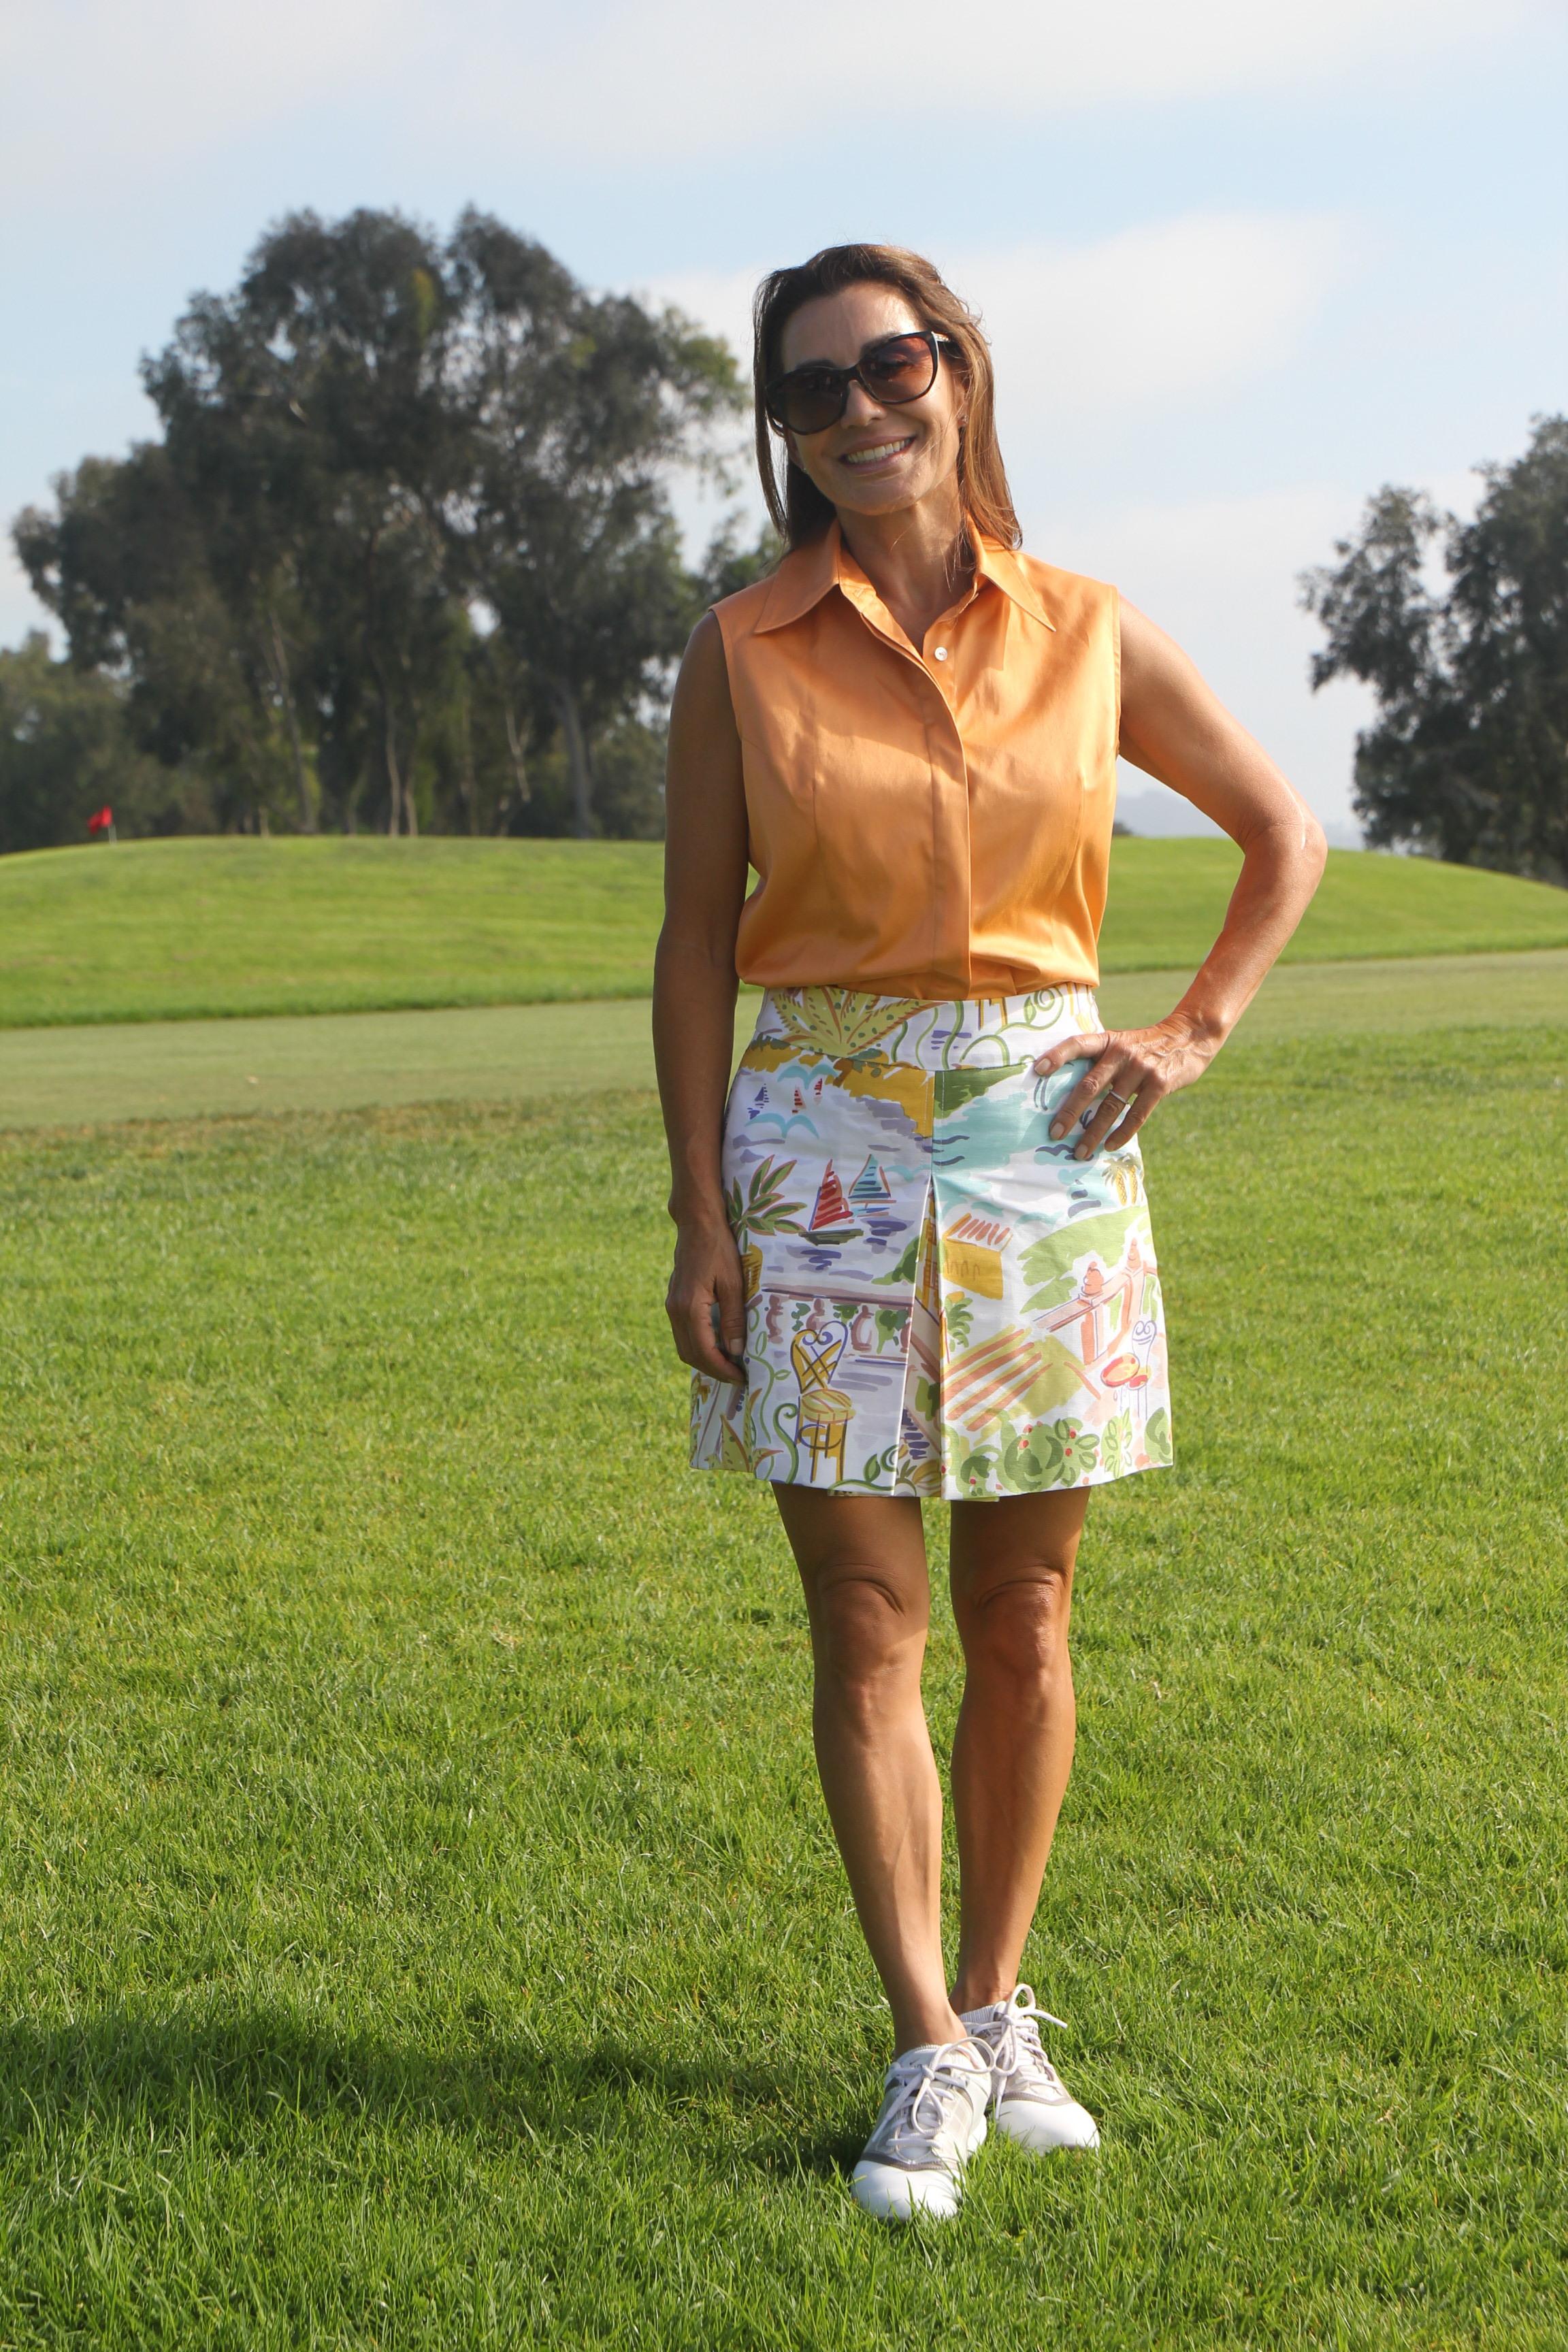 Proper Golf Attire — Jule